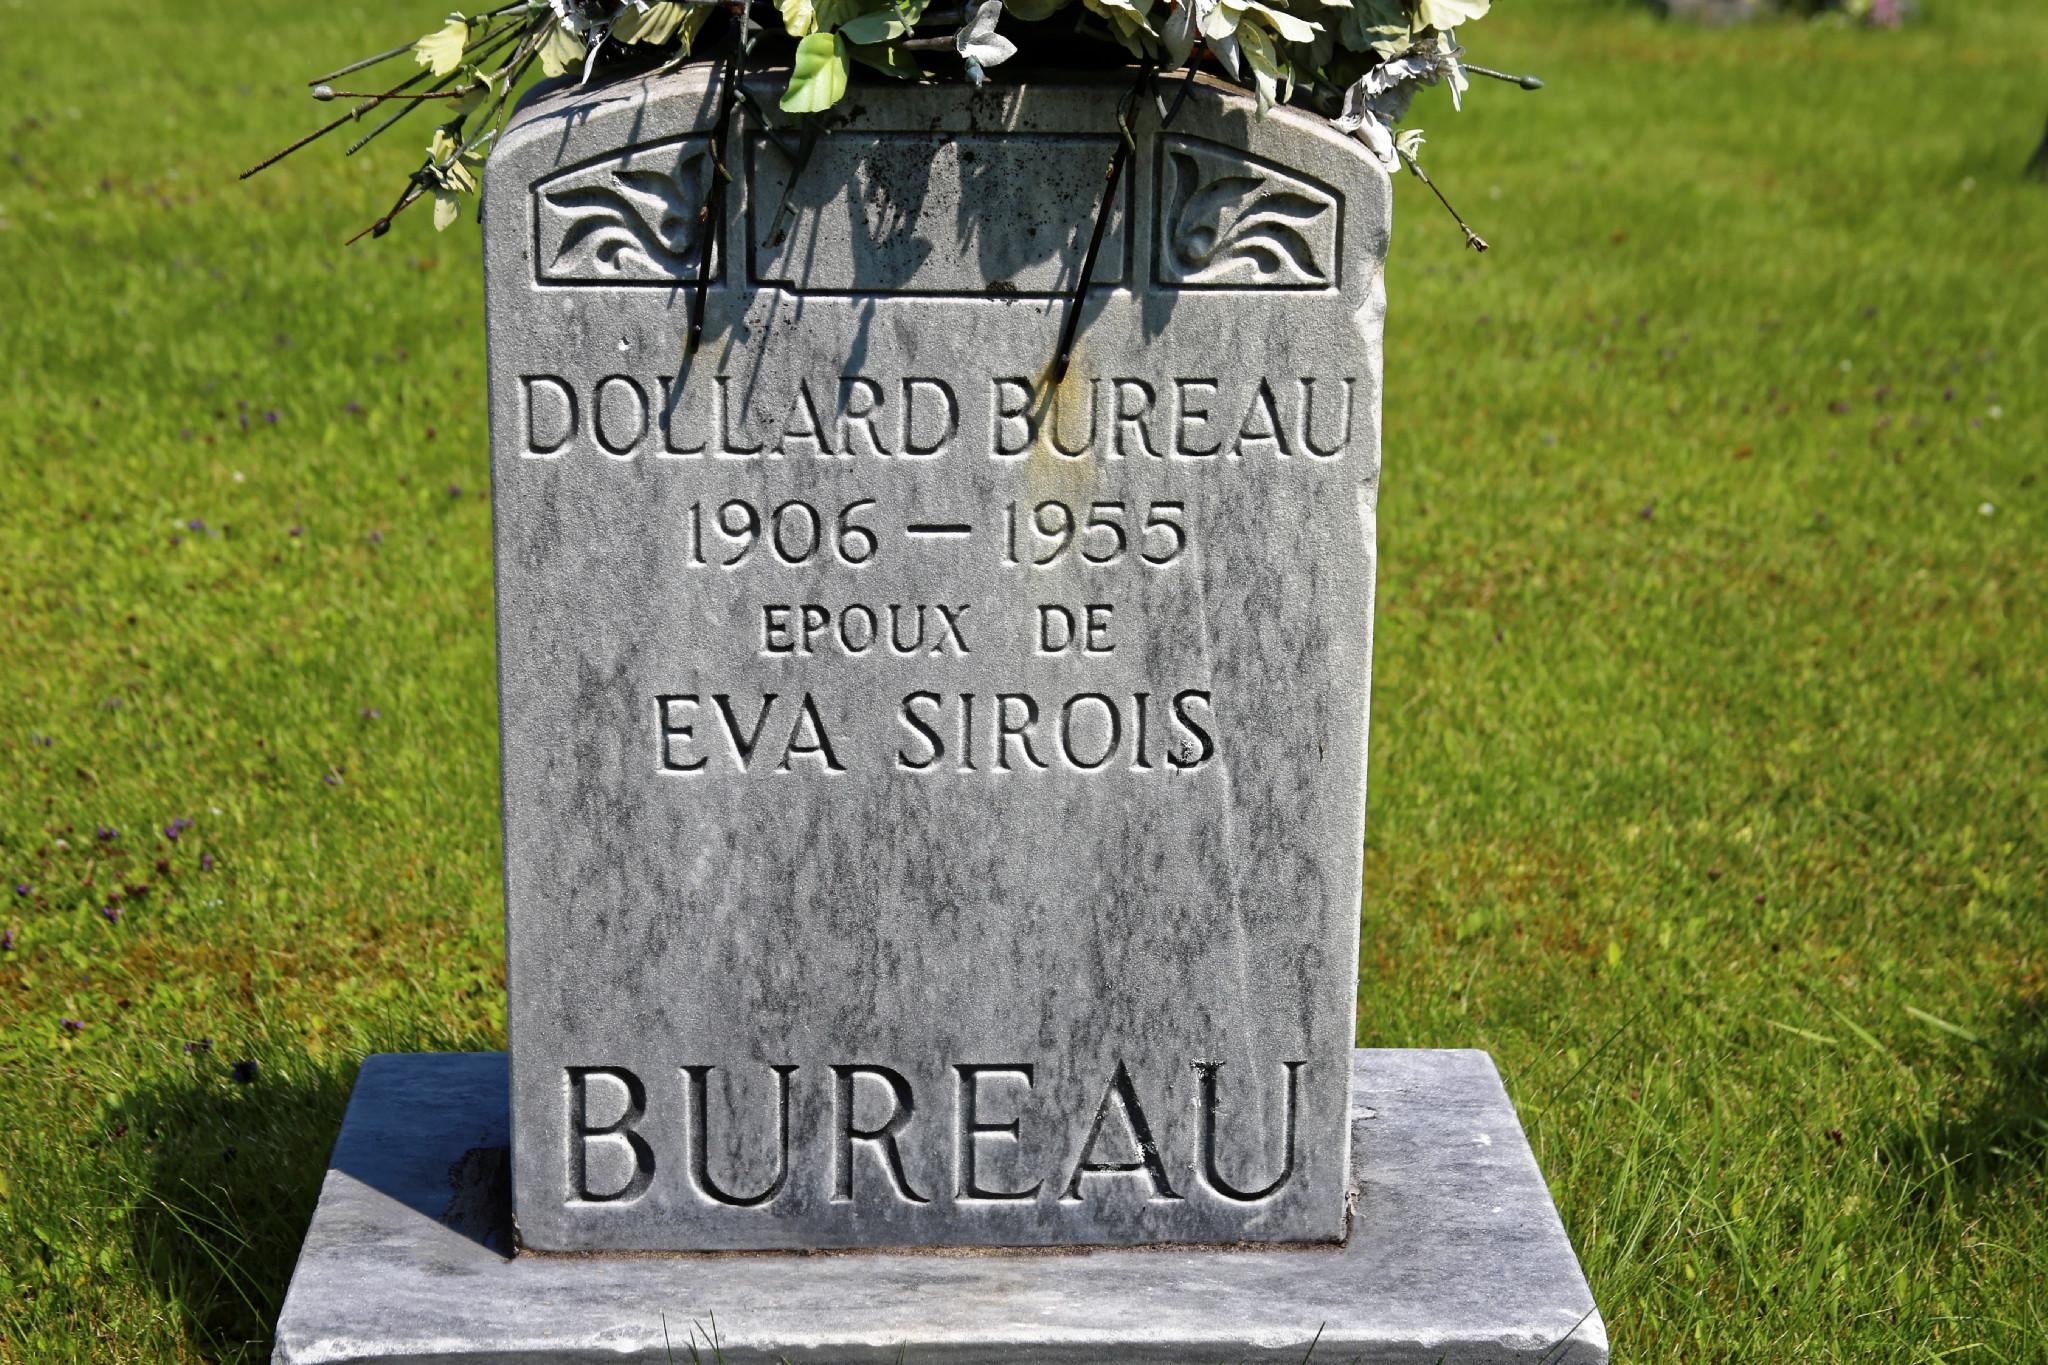 Dollard Bureau